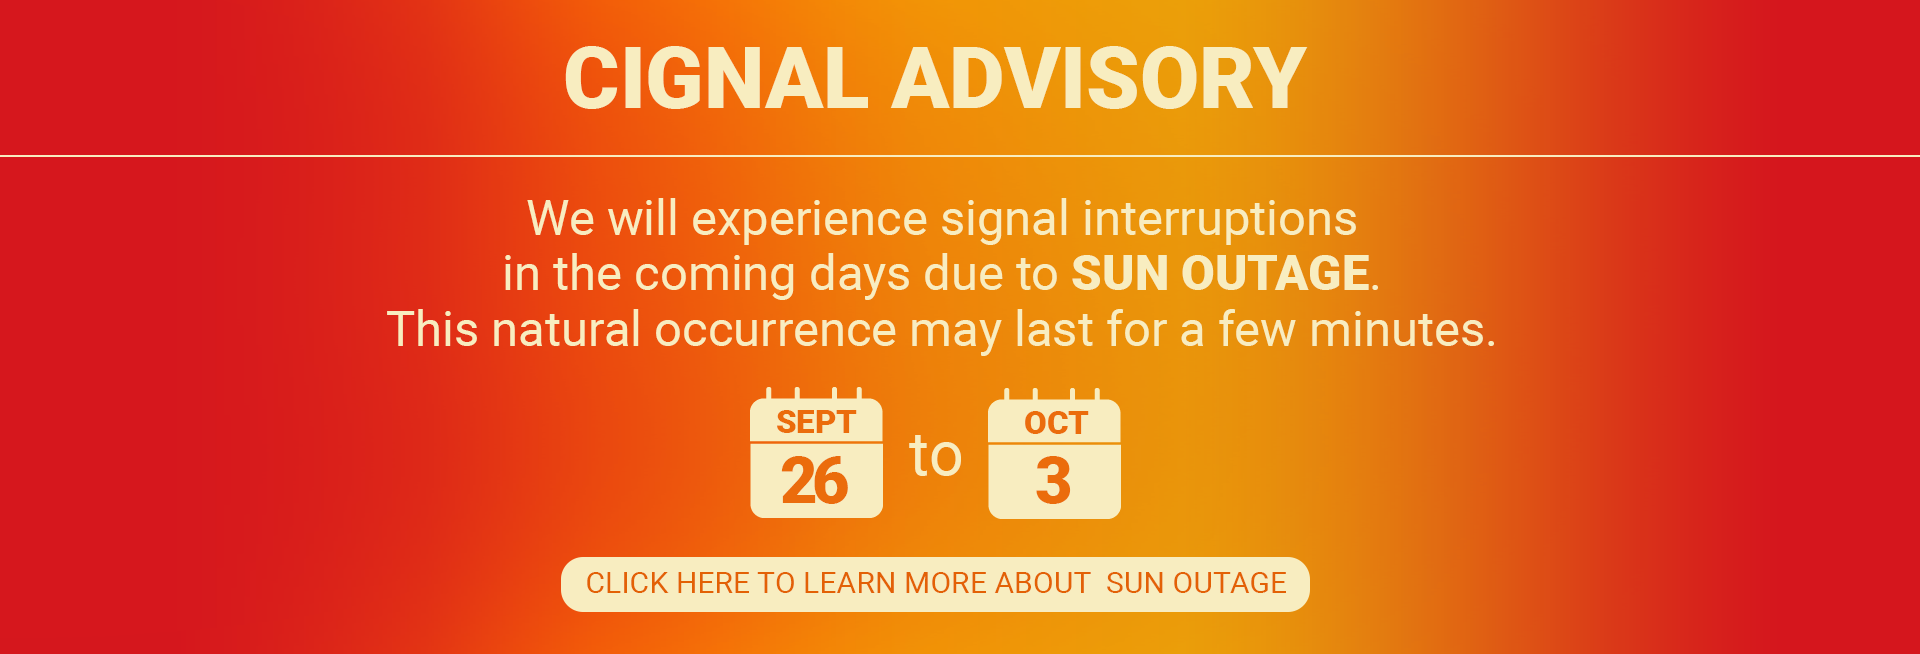 Sun Outage Advisory